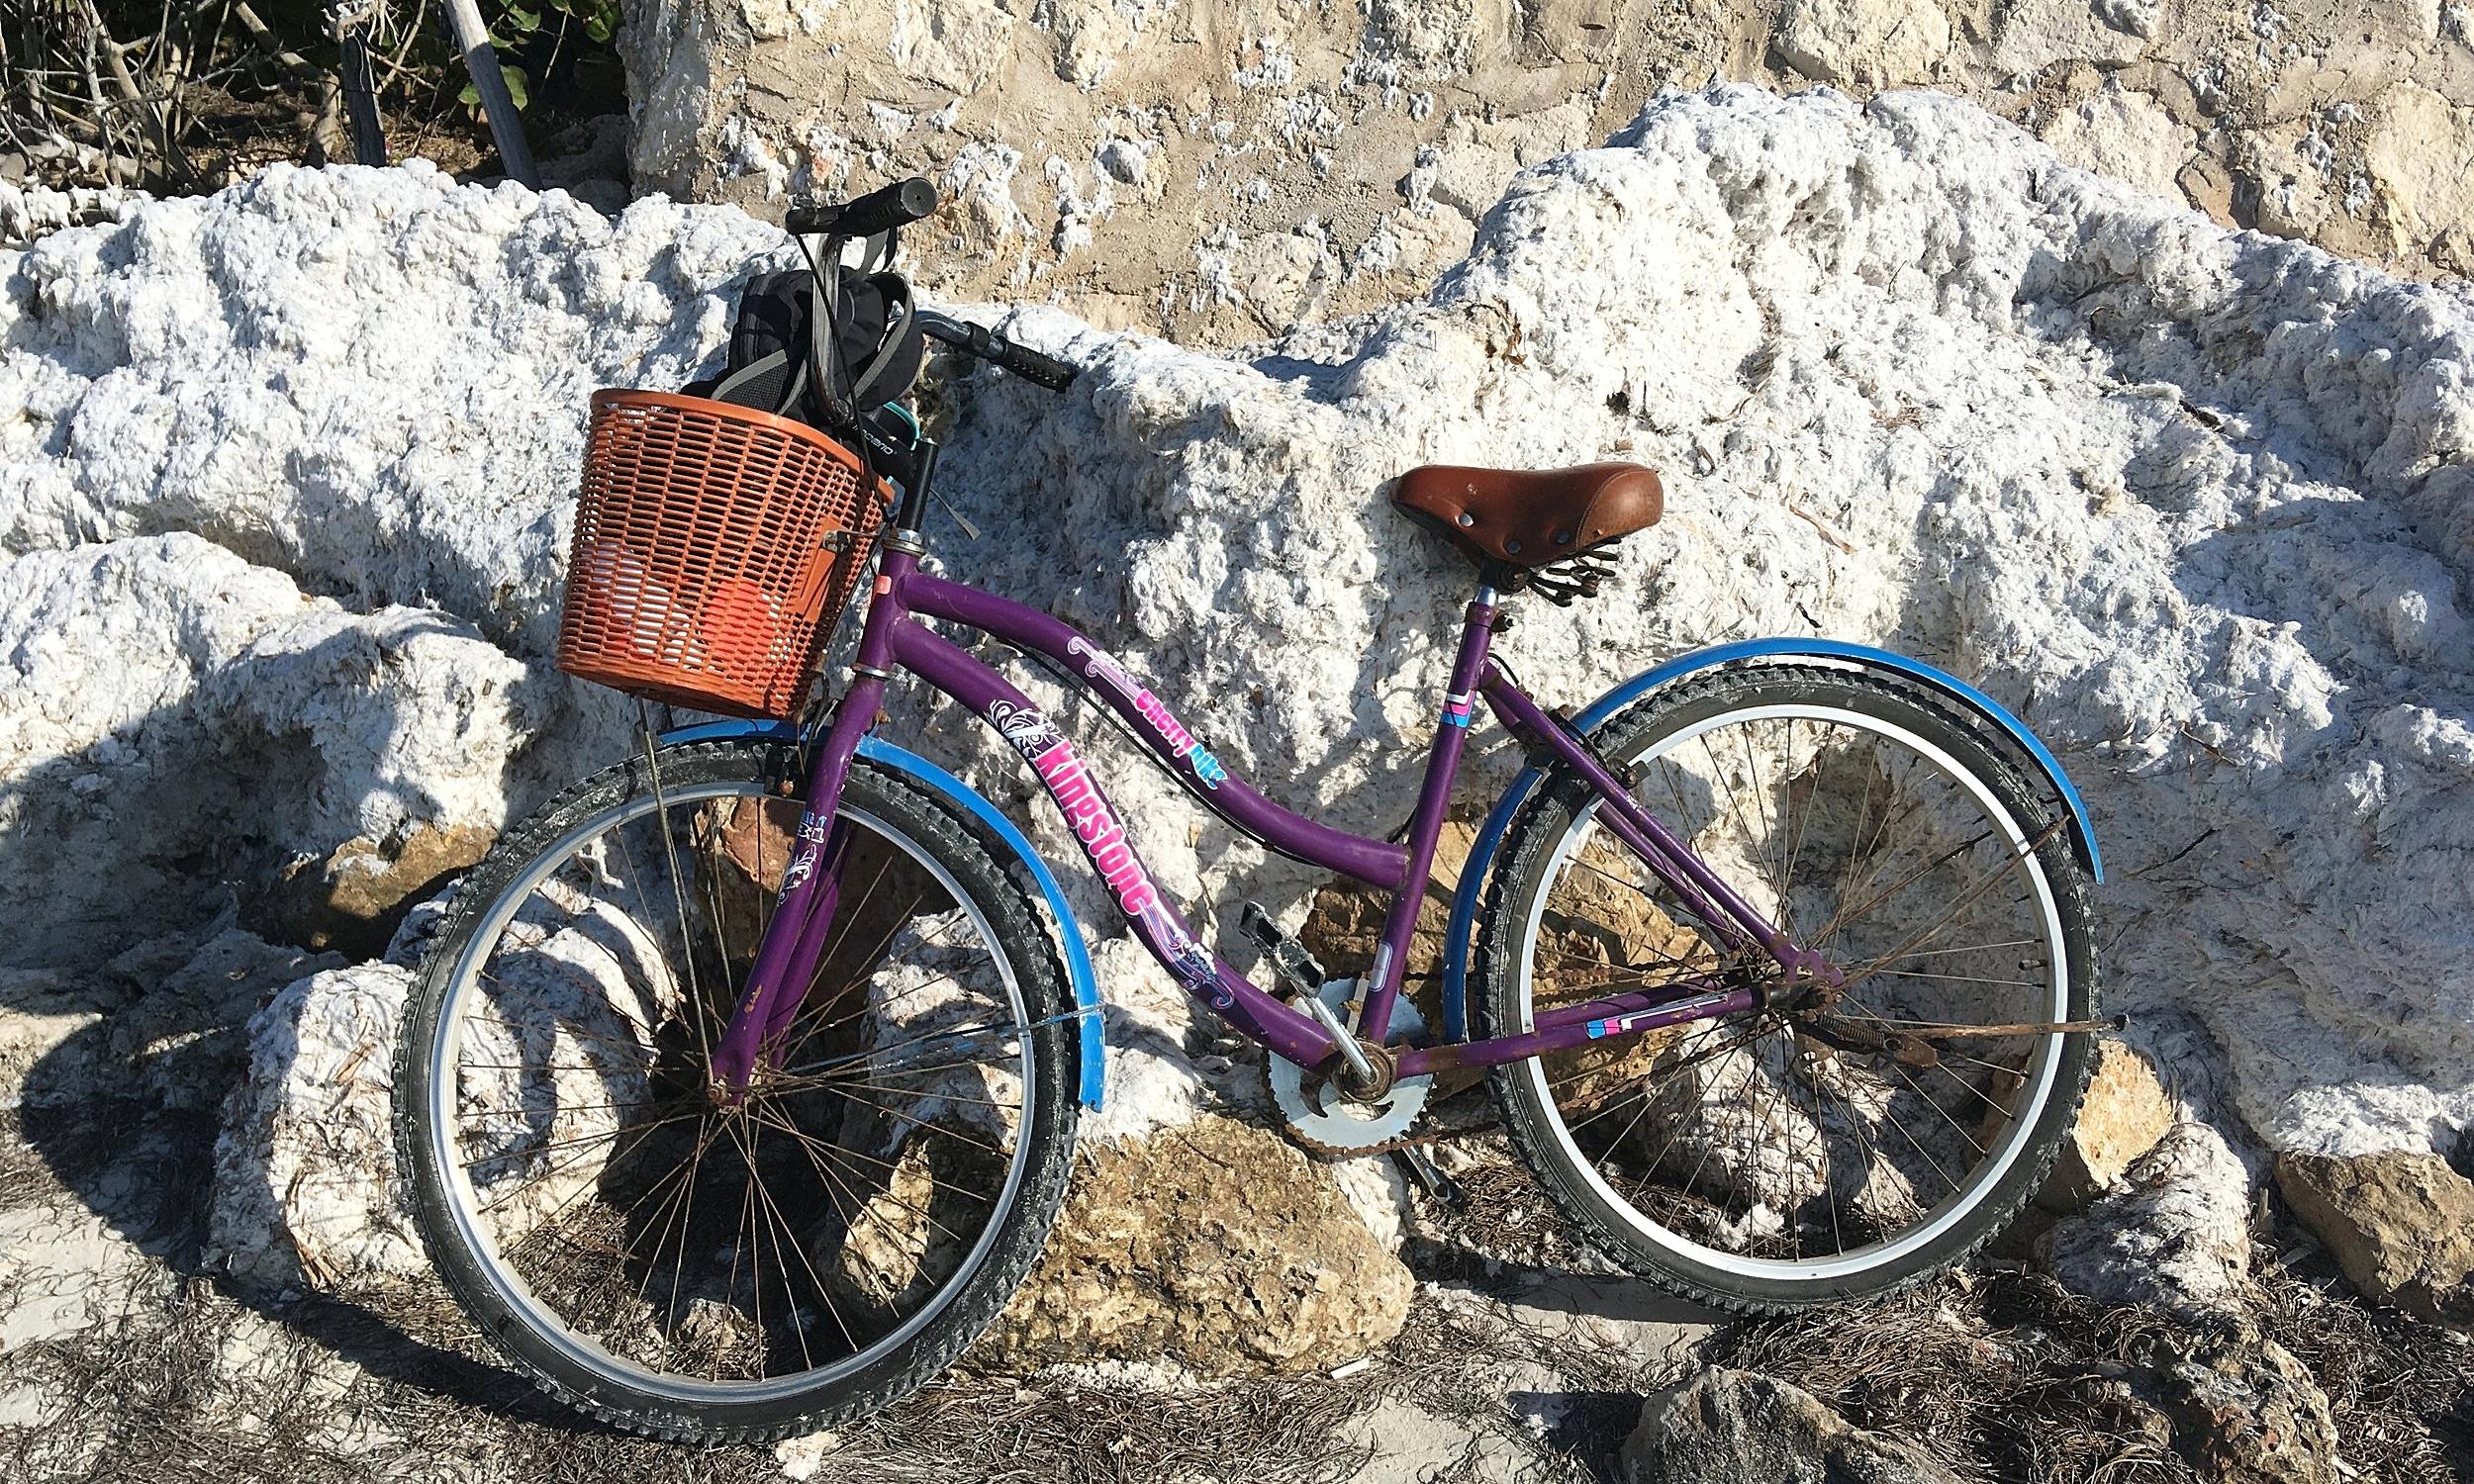 My bike bestie